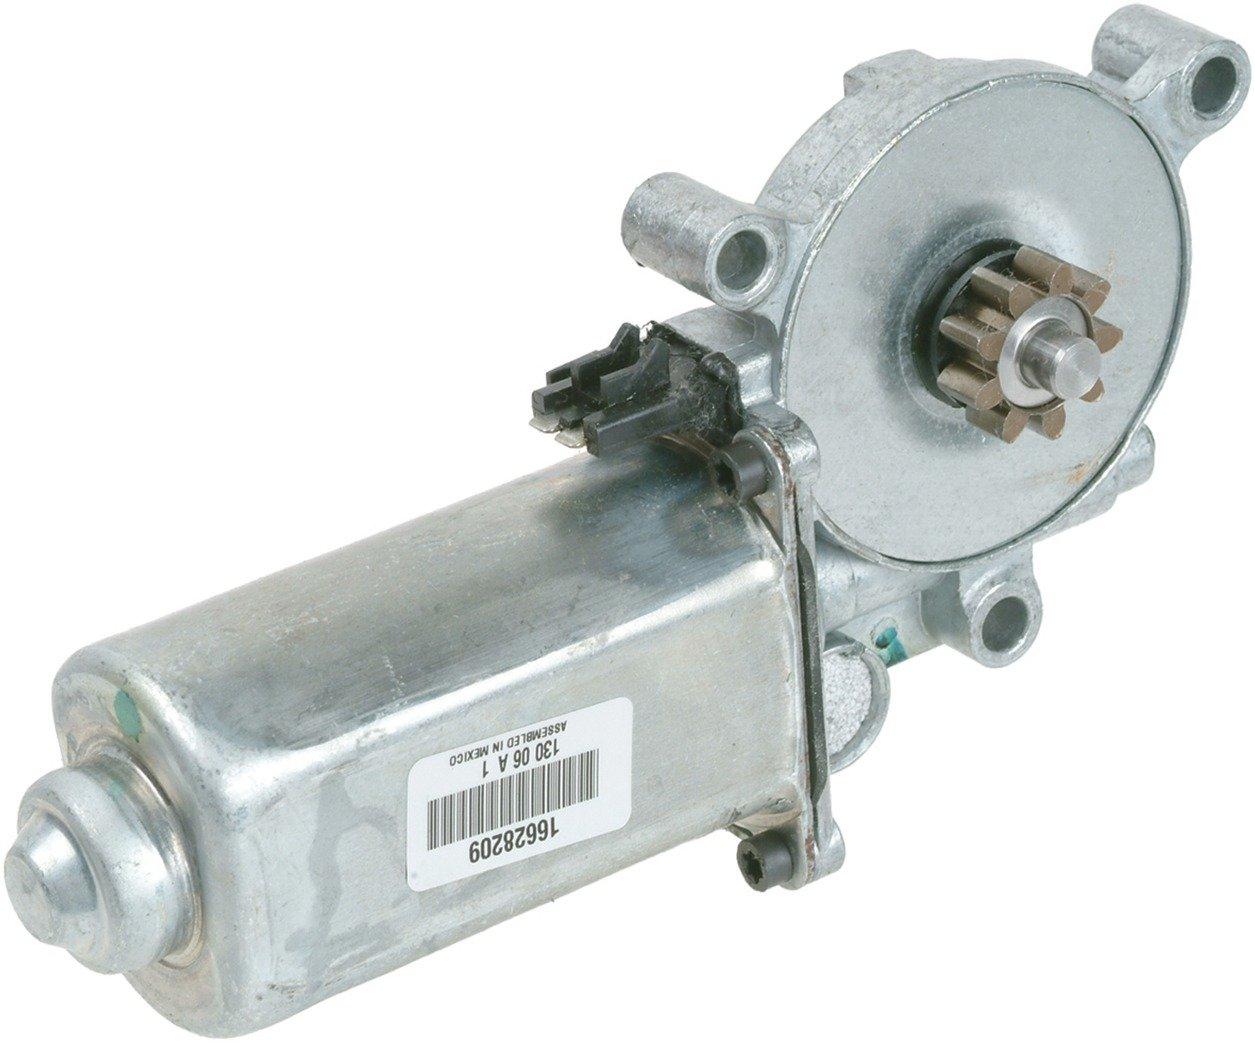 Cardone Select 82-910 New Window Lift Motor